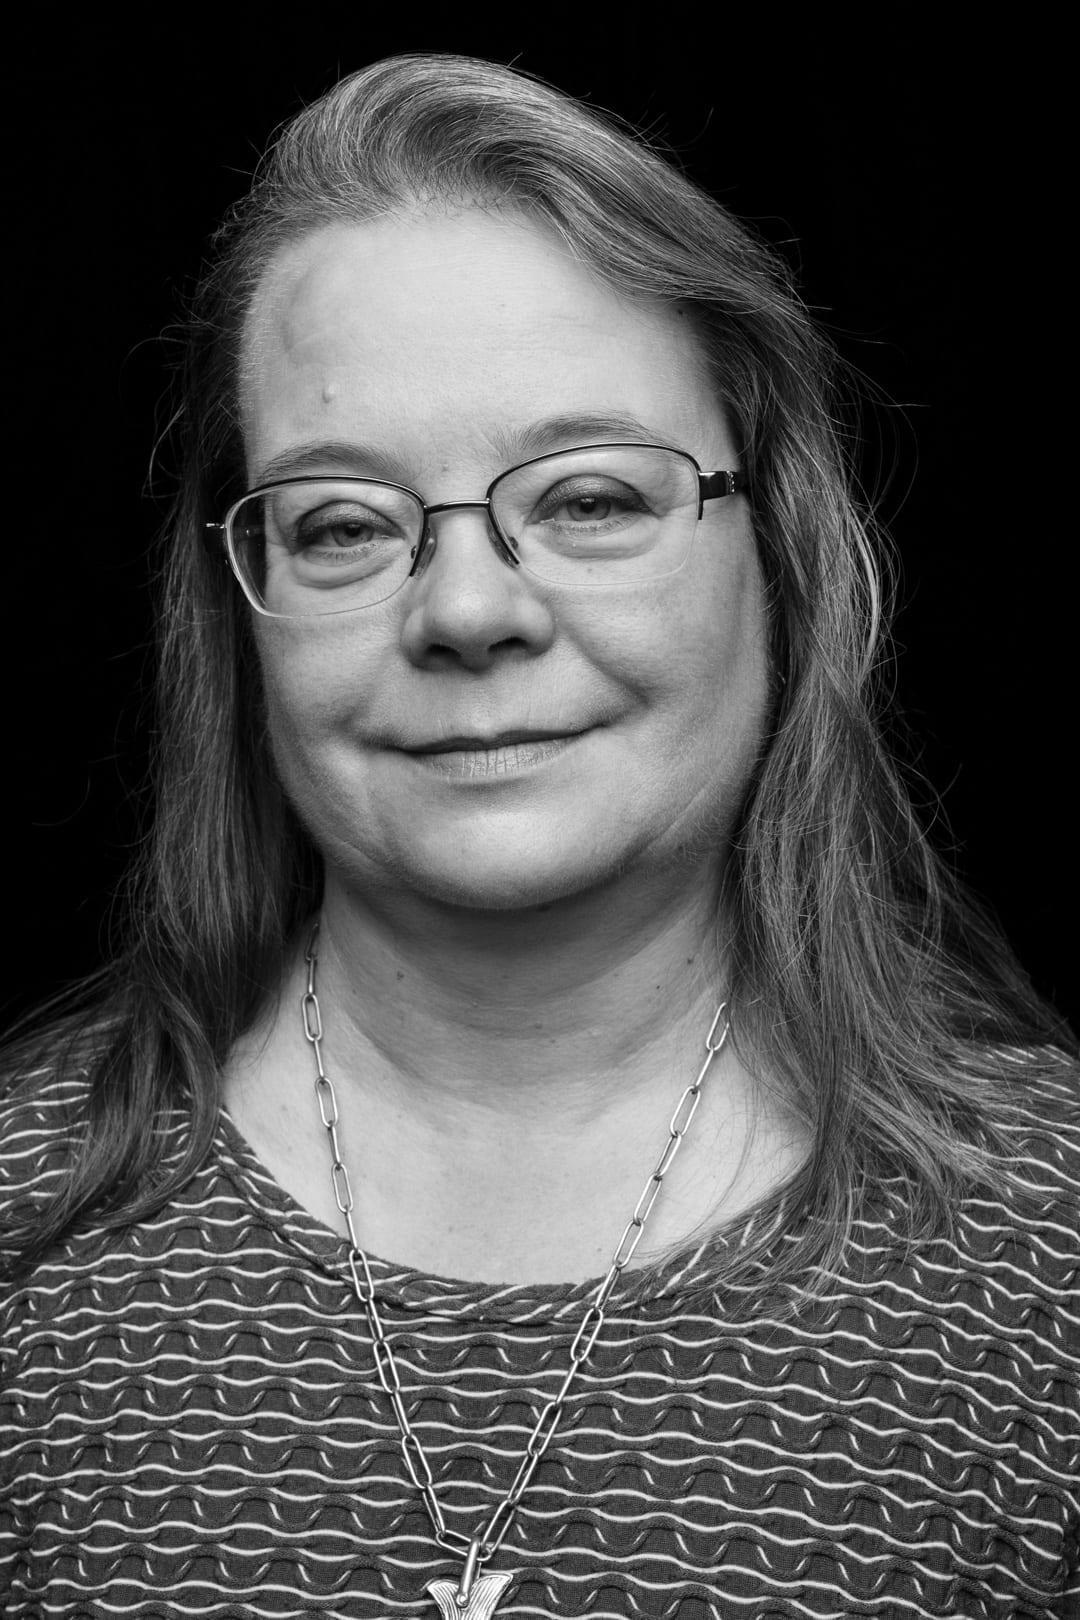 Karen Mobley